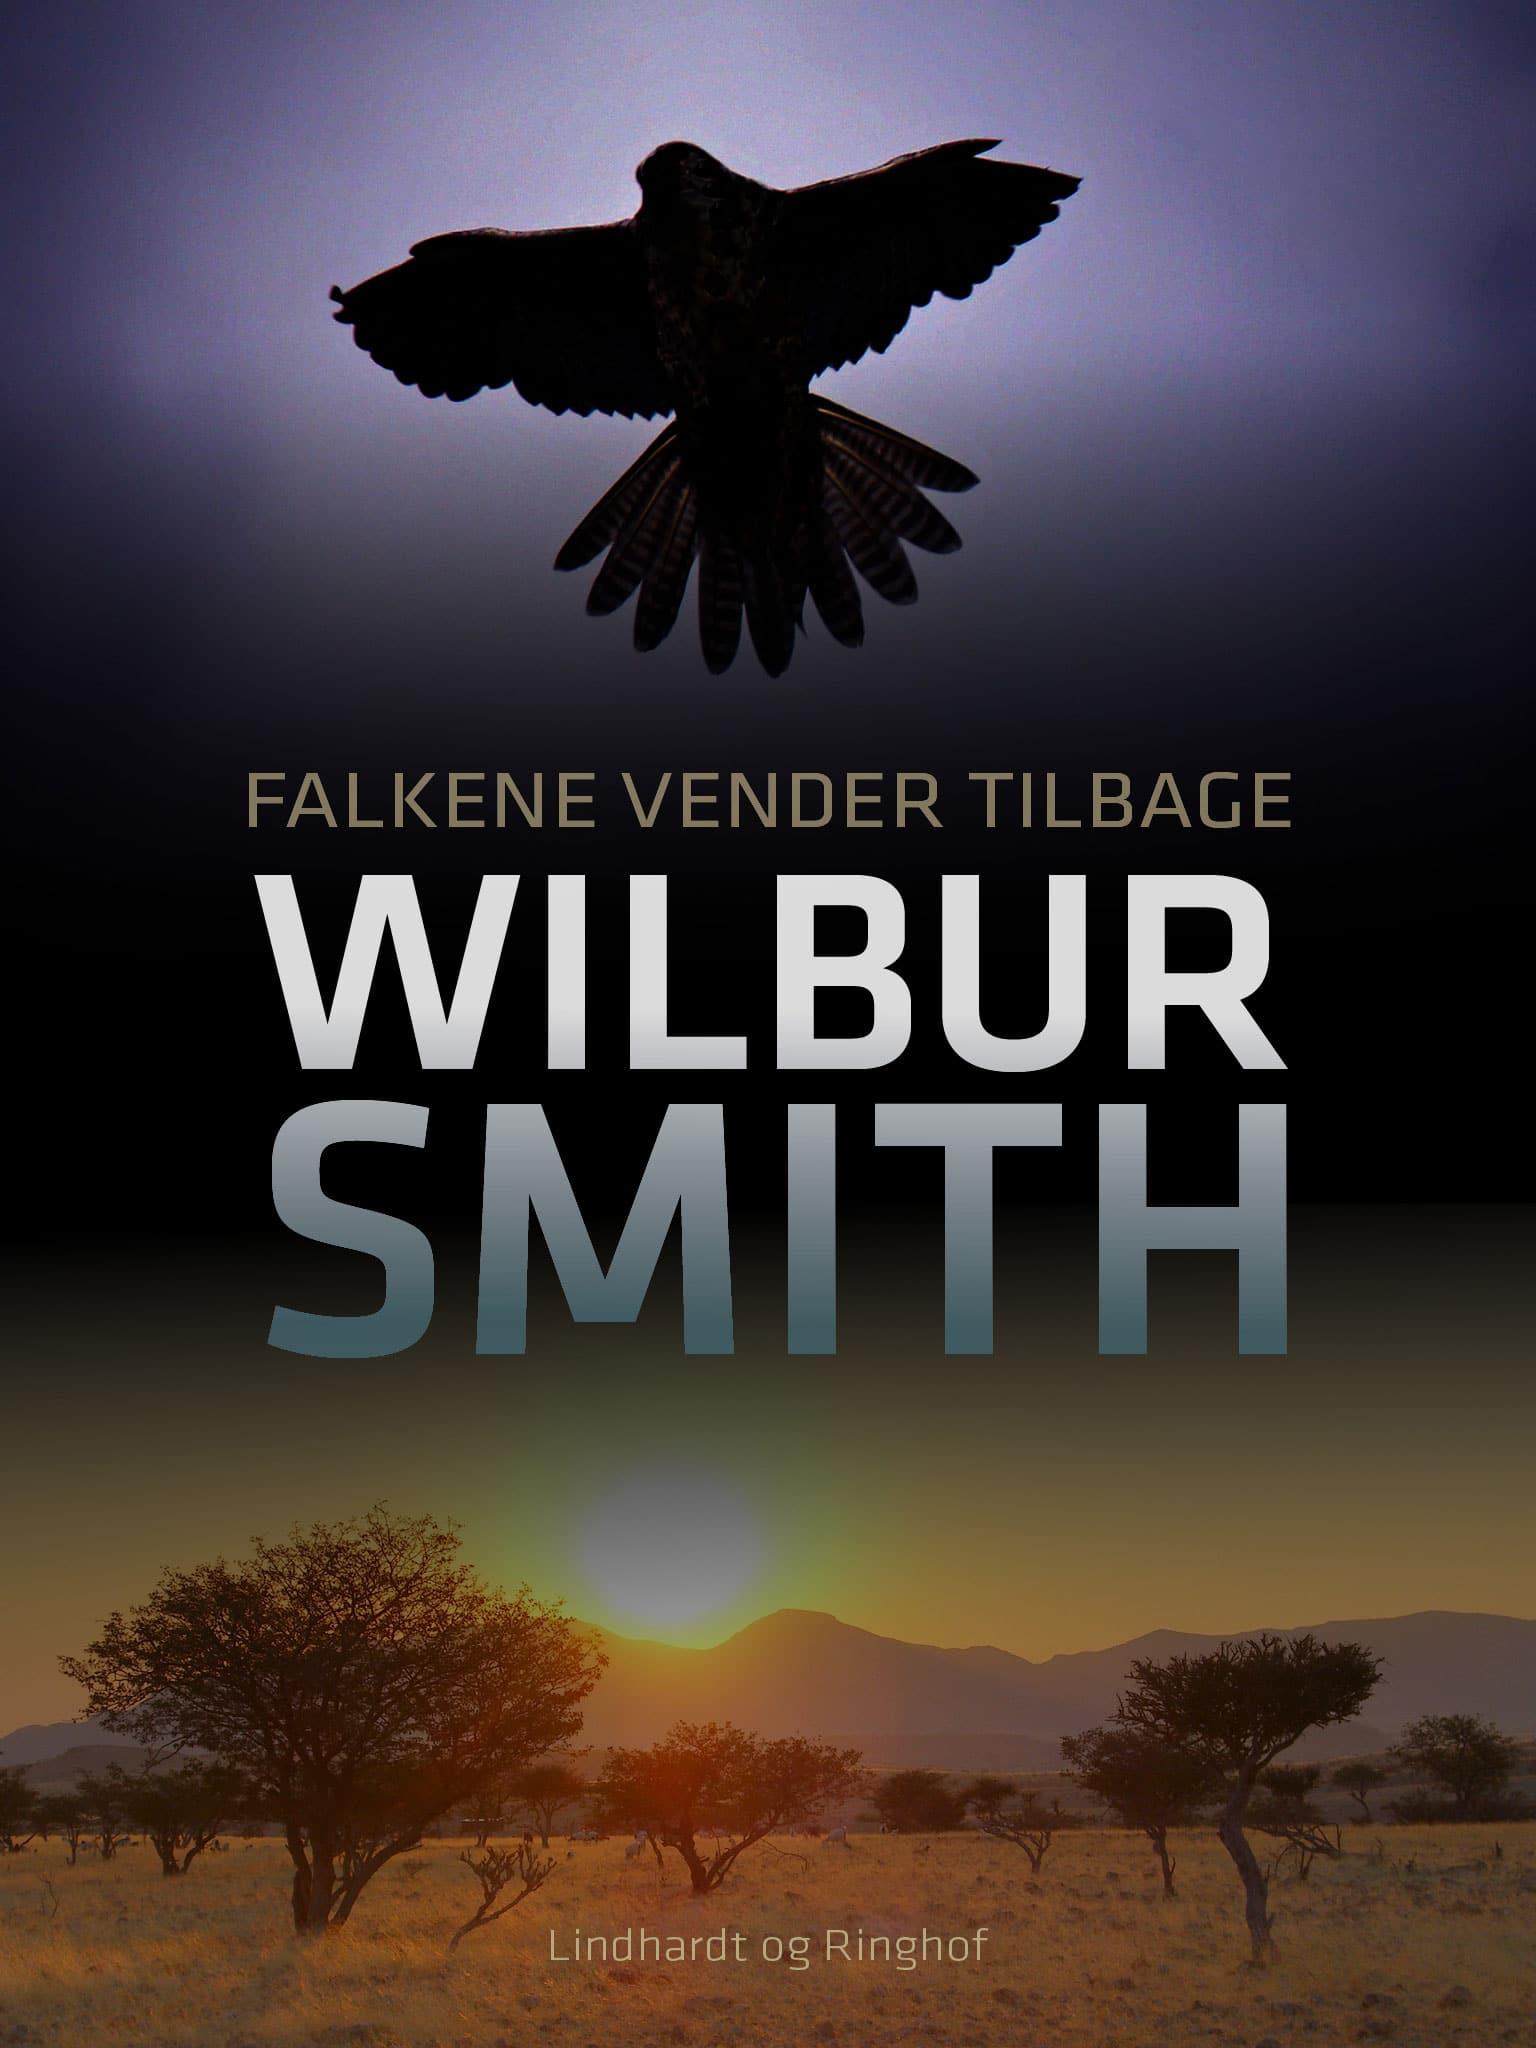 Falkene vender tilbage, Wilbur Smith, Ballantyne, Ballantyne-serien